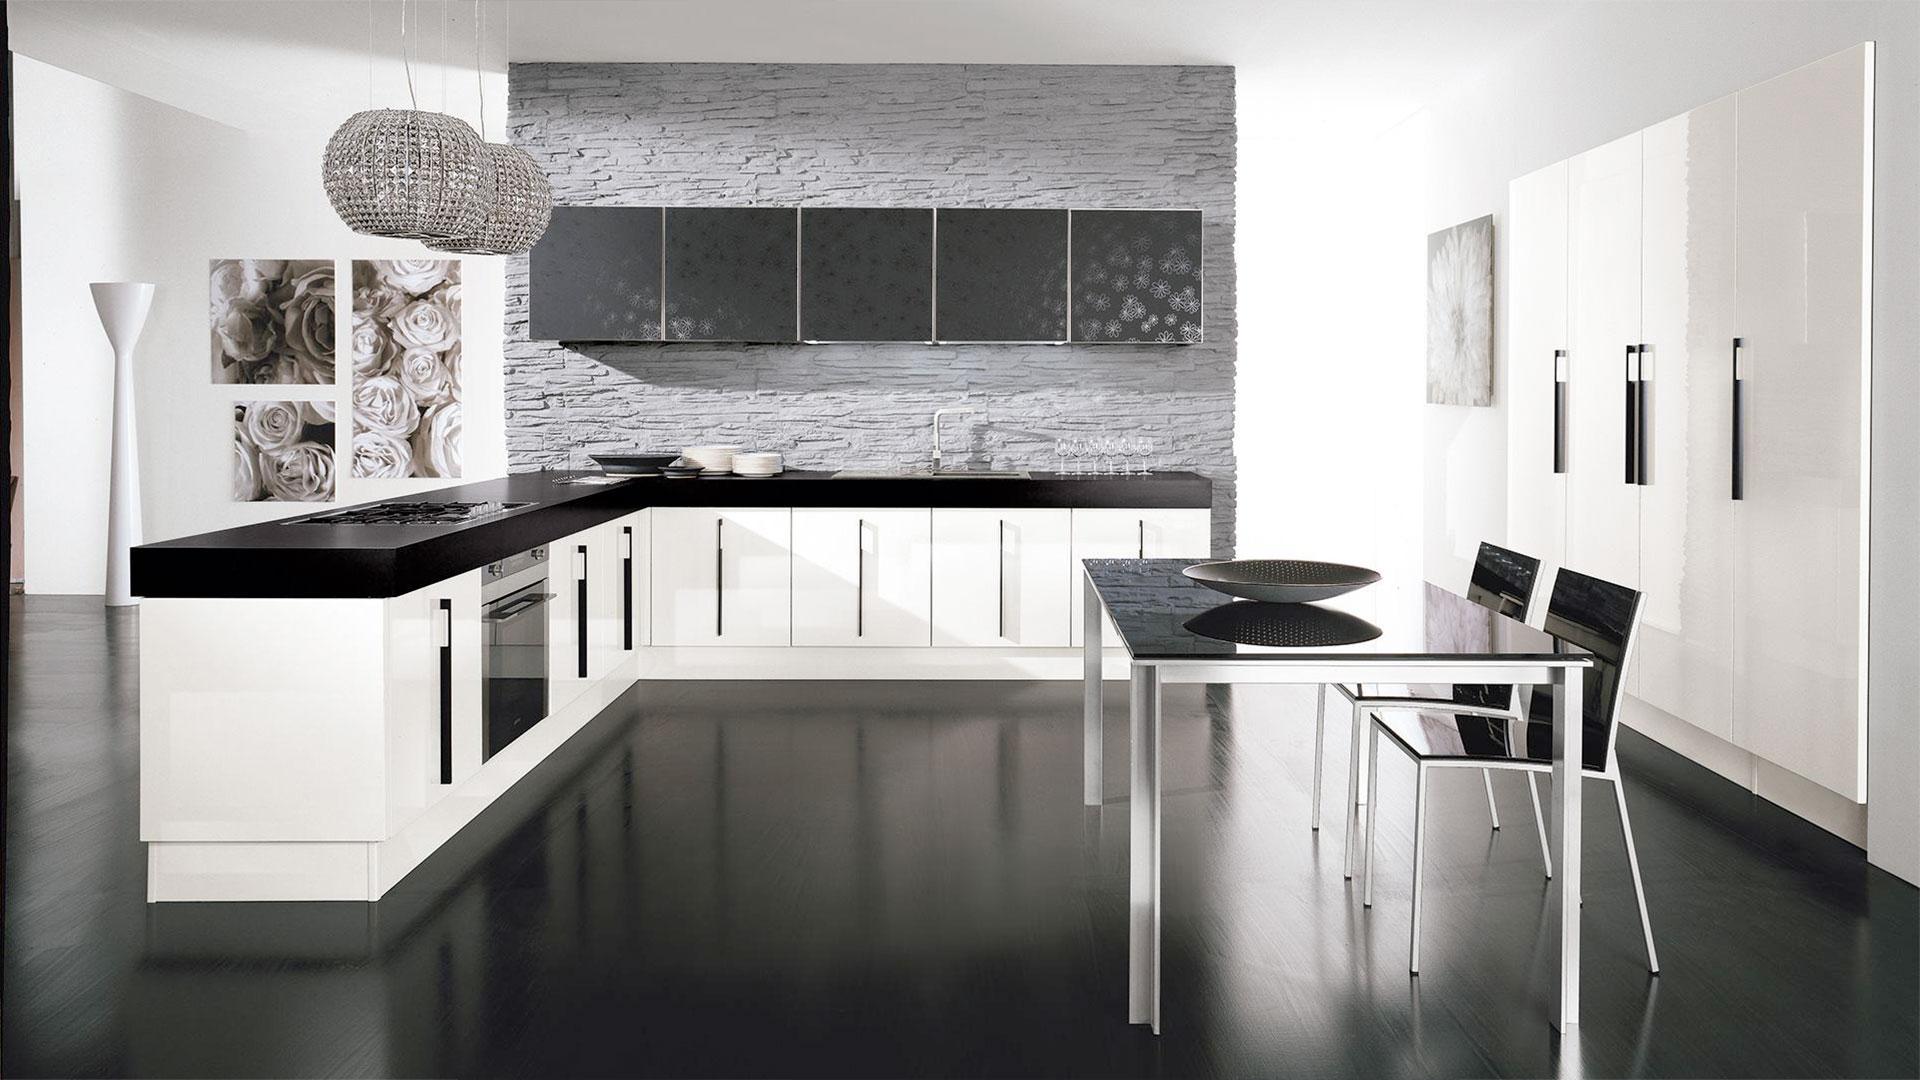 Comporre cucine progettare una cucina per un loft with comporre cucine cucine al mercatone uno - Comporre una cucina ...